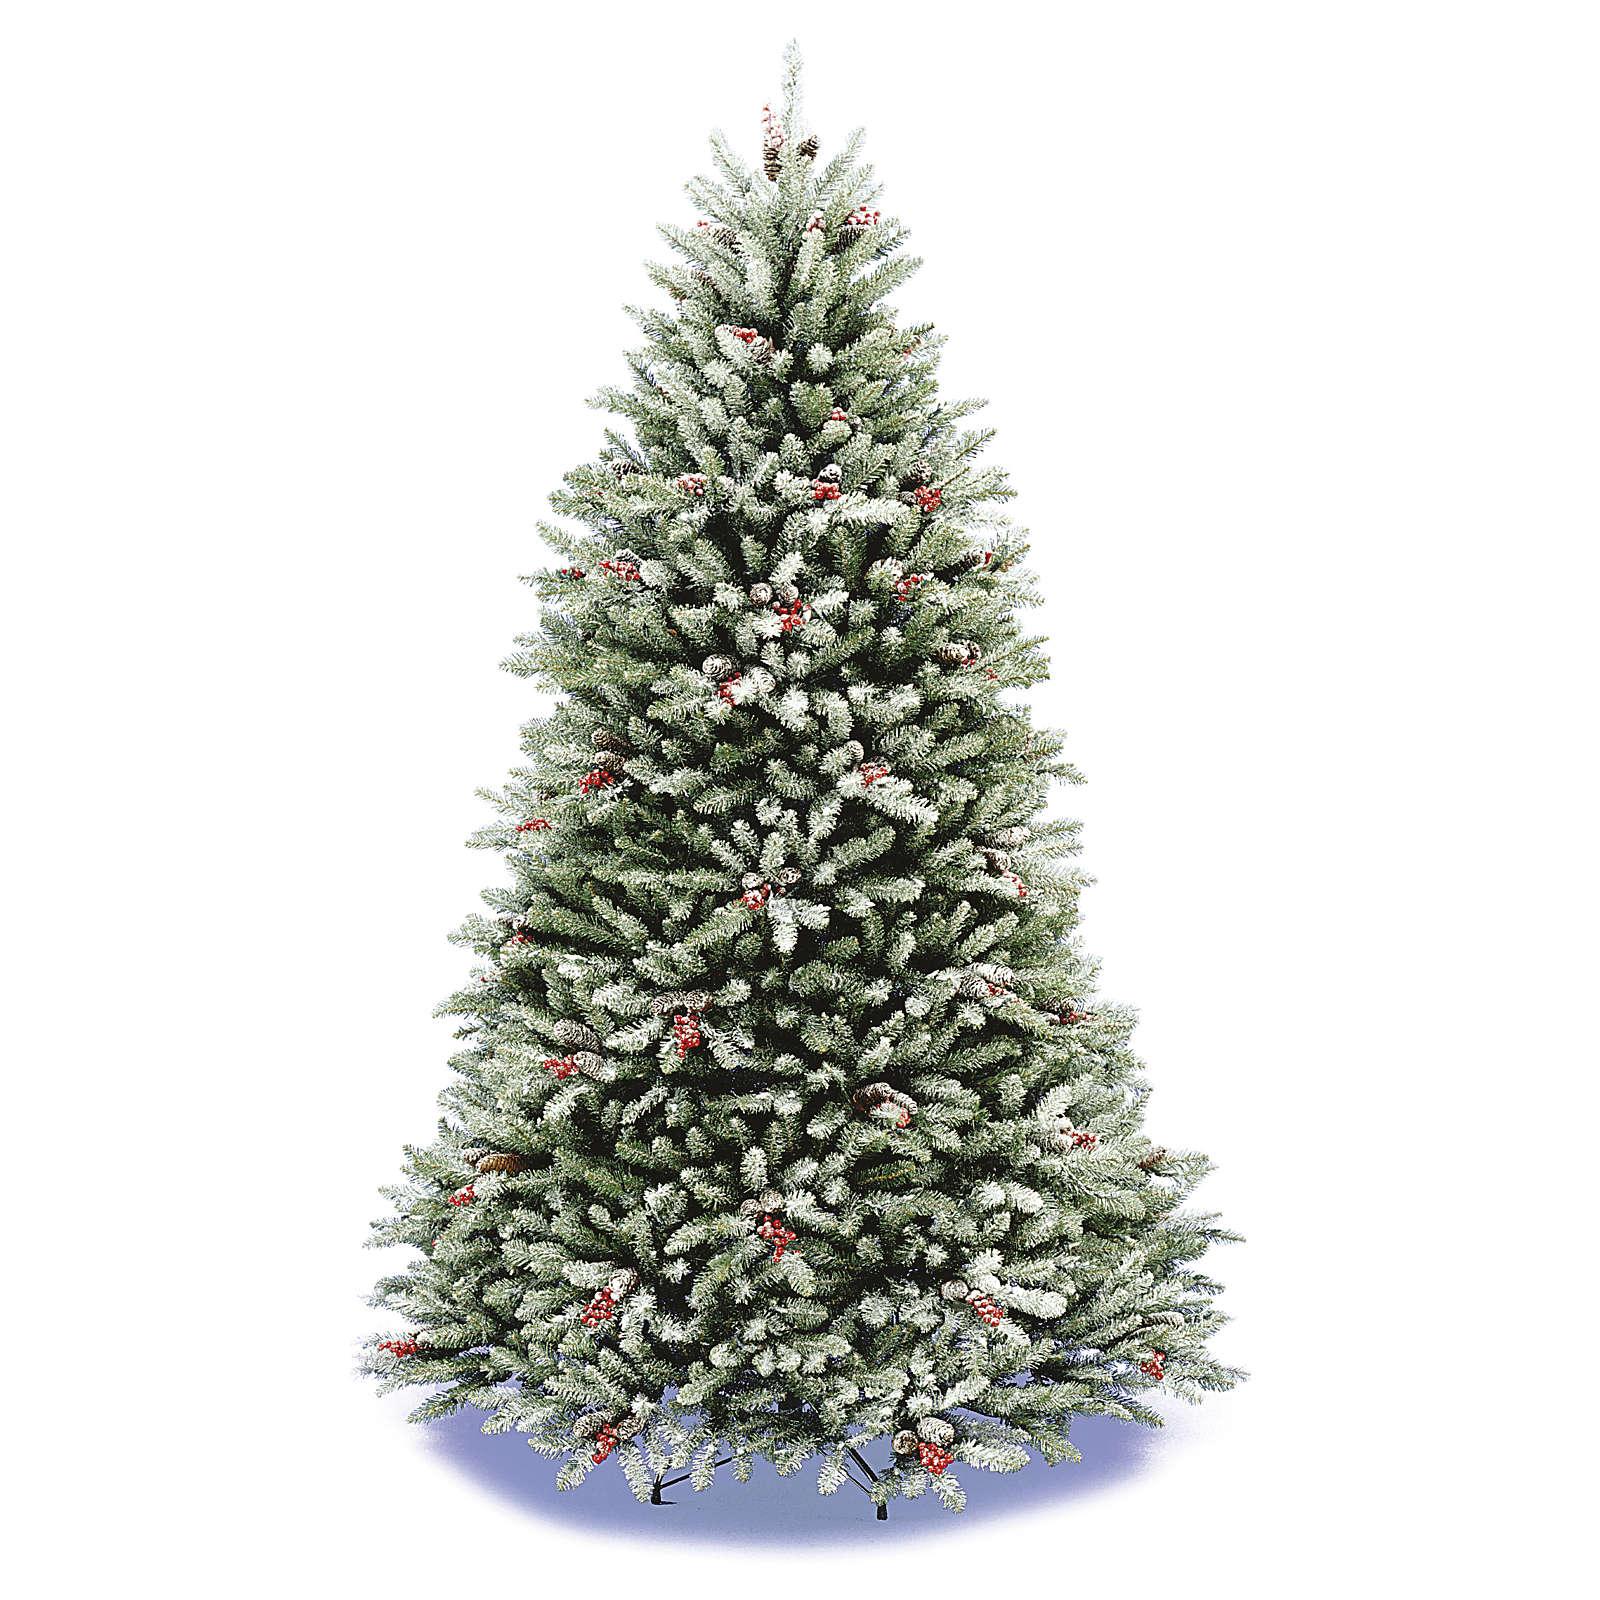 Árbol de Navidad 180 cm copos de neve piñas bayas Dunhill 3